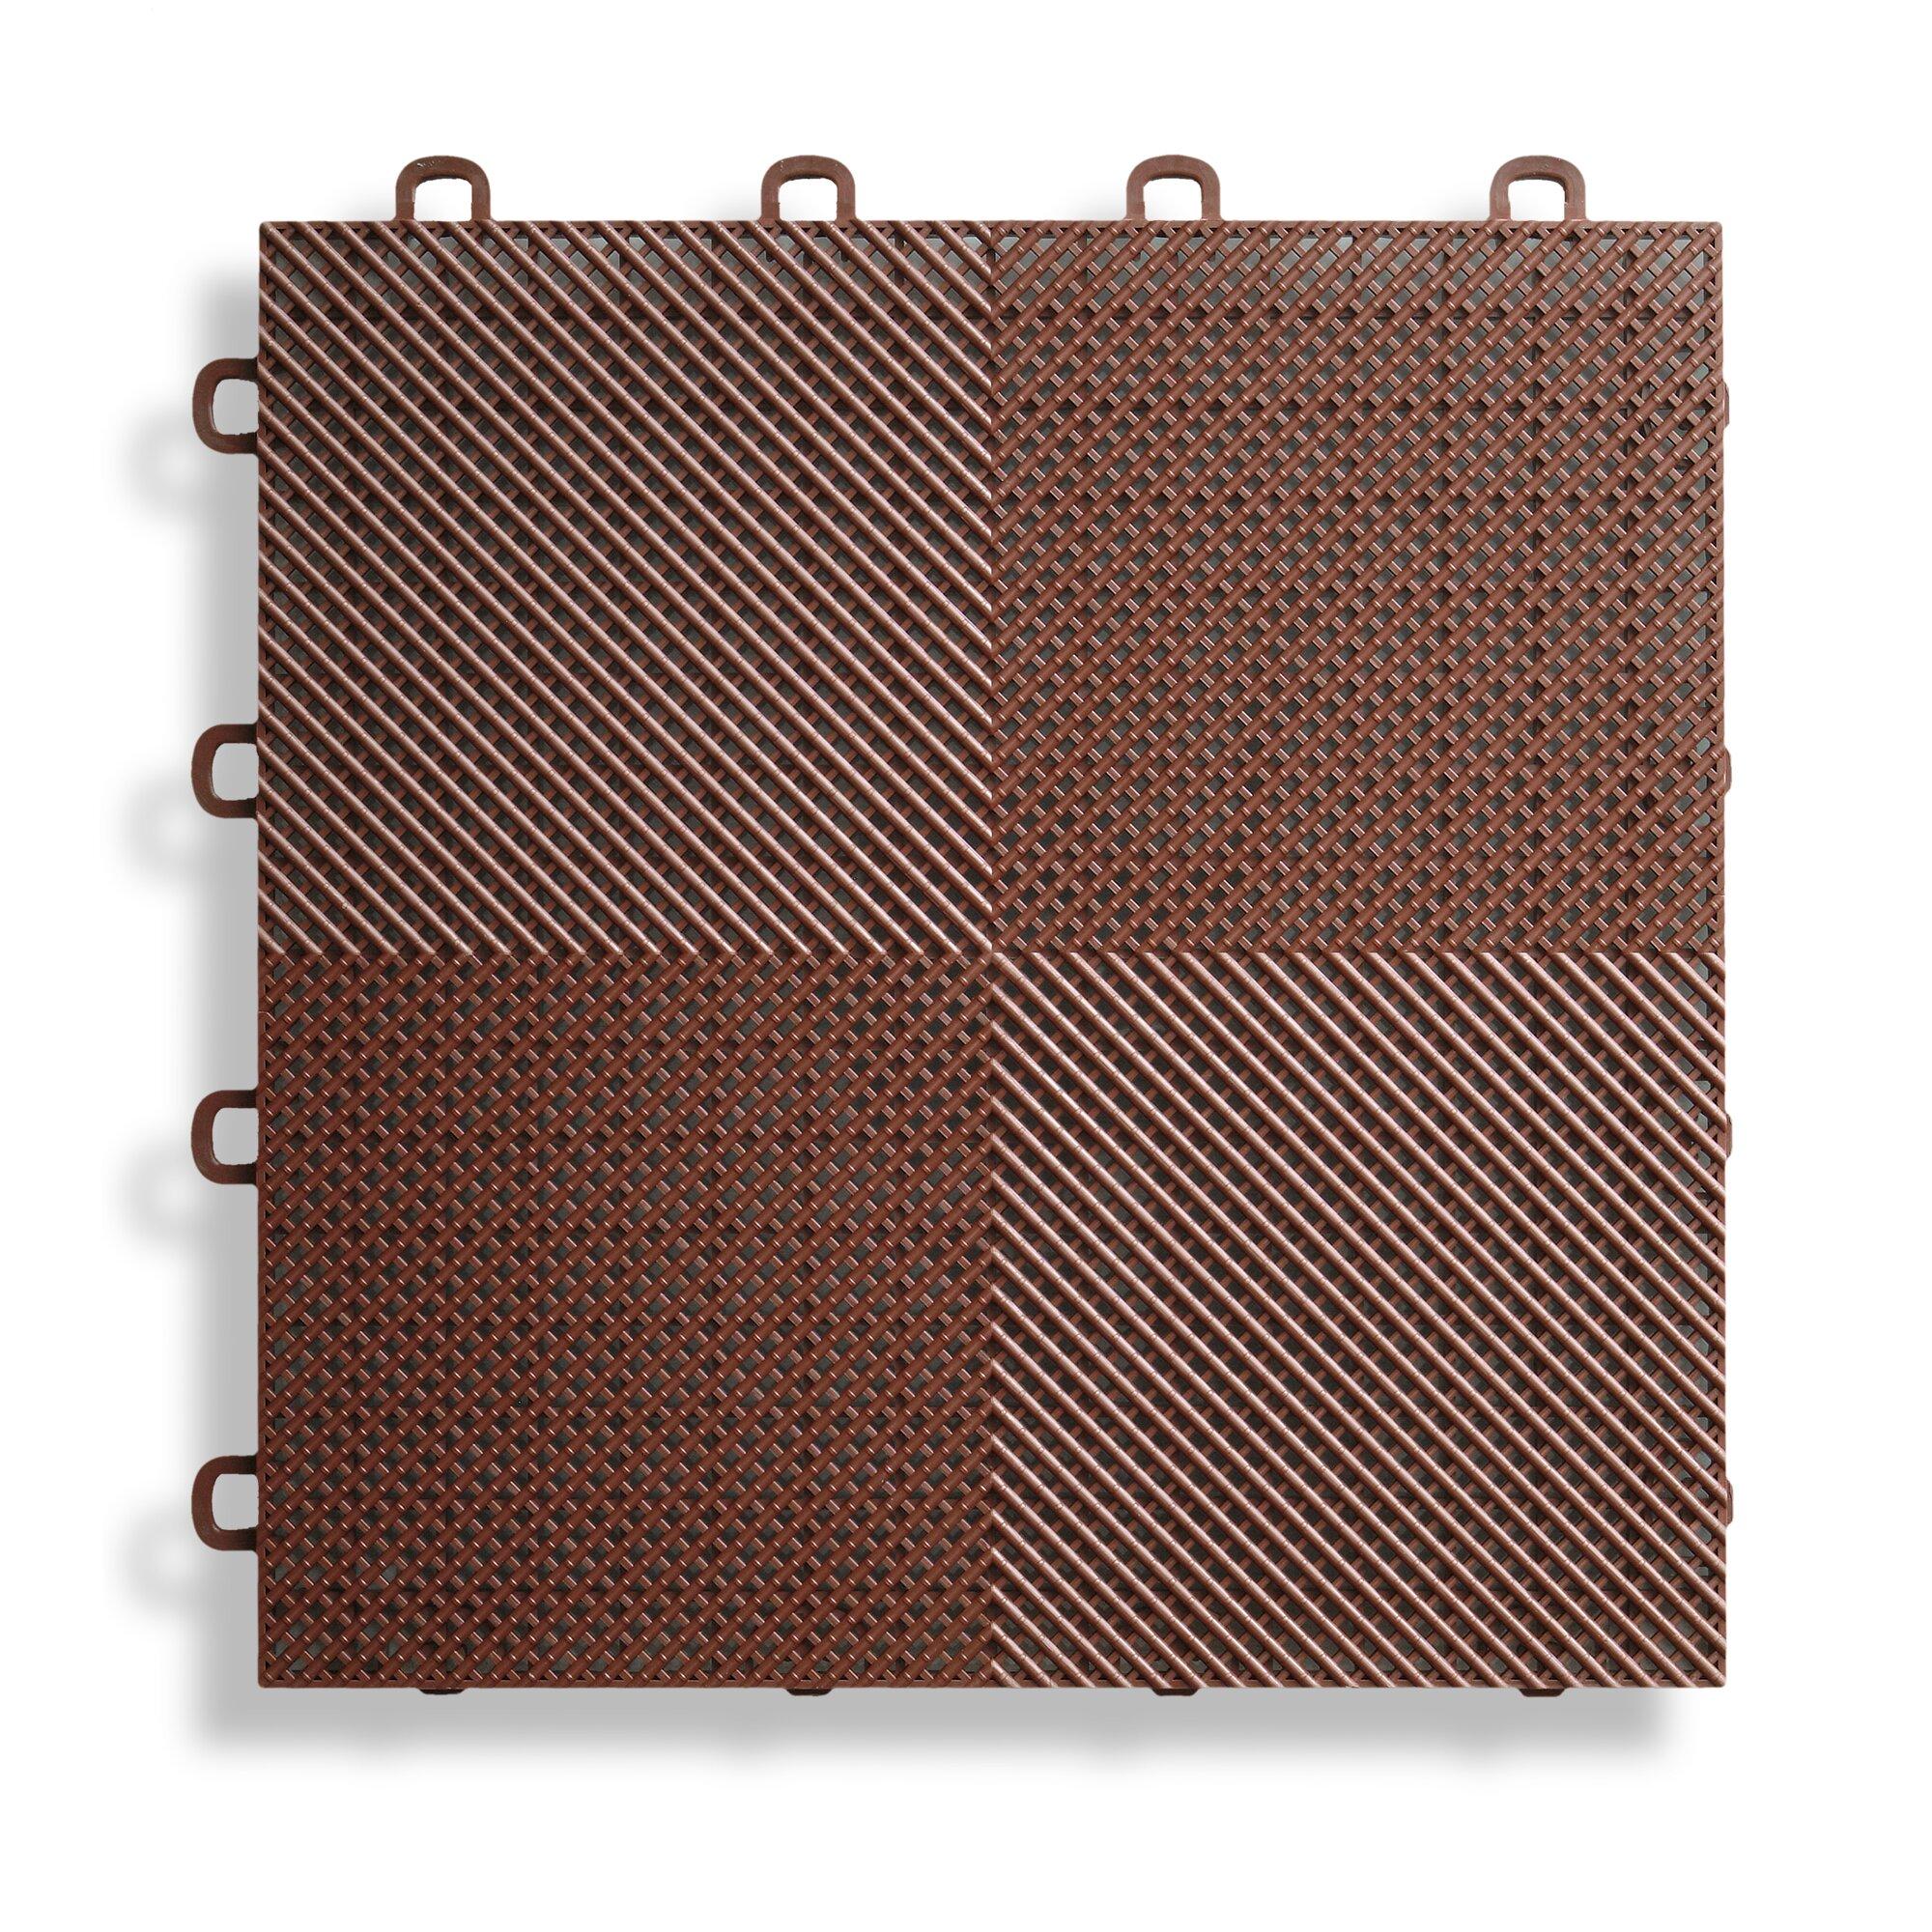 Blocktile 12 Quot X 12 Quot Deck And Patio Flooring Tile In Brown